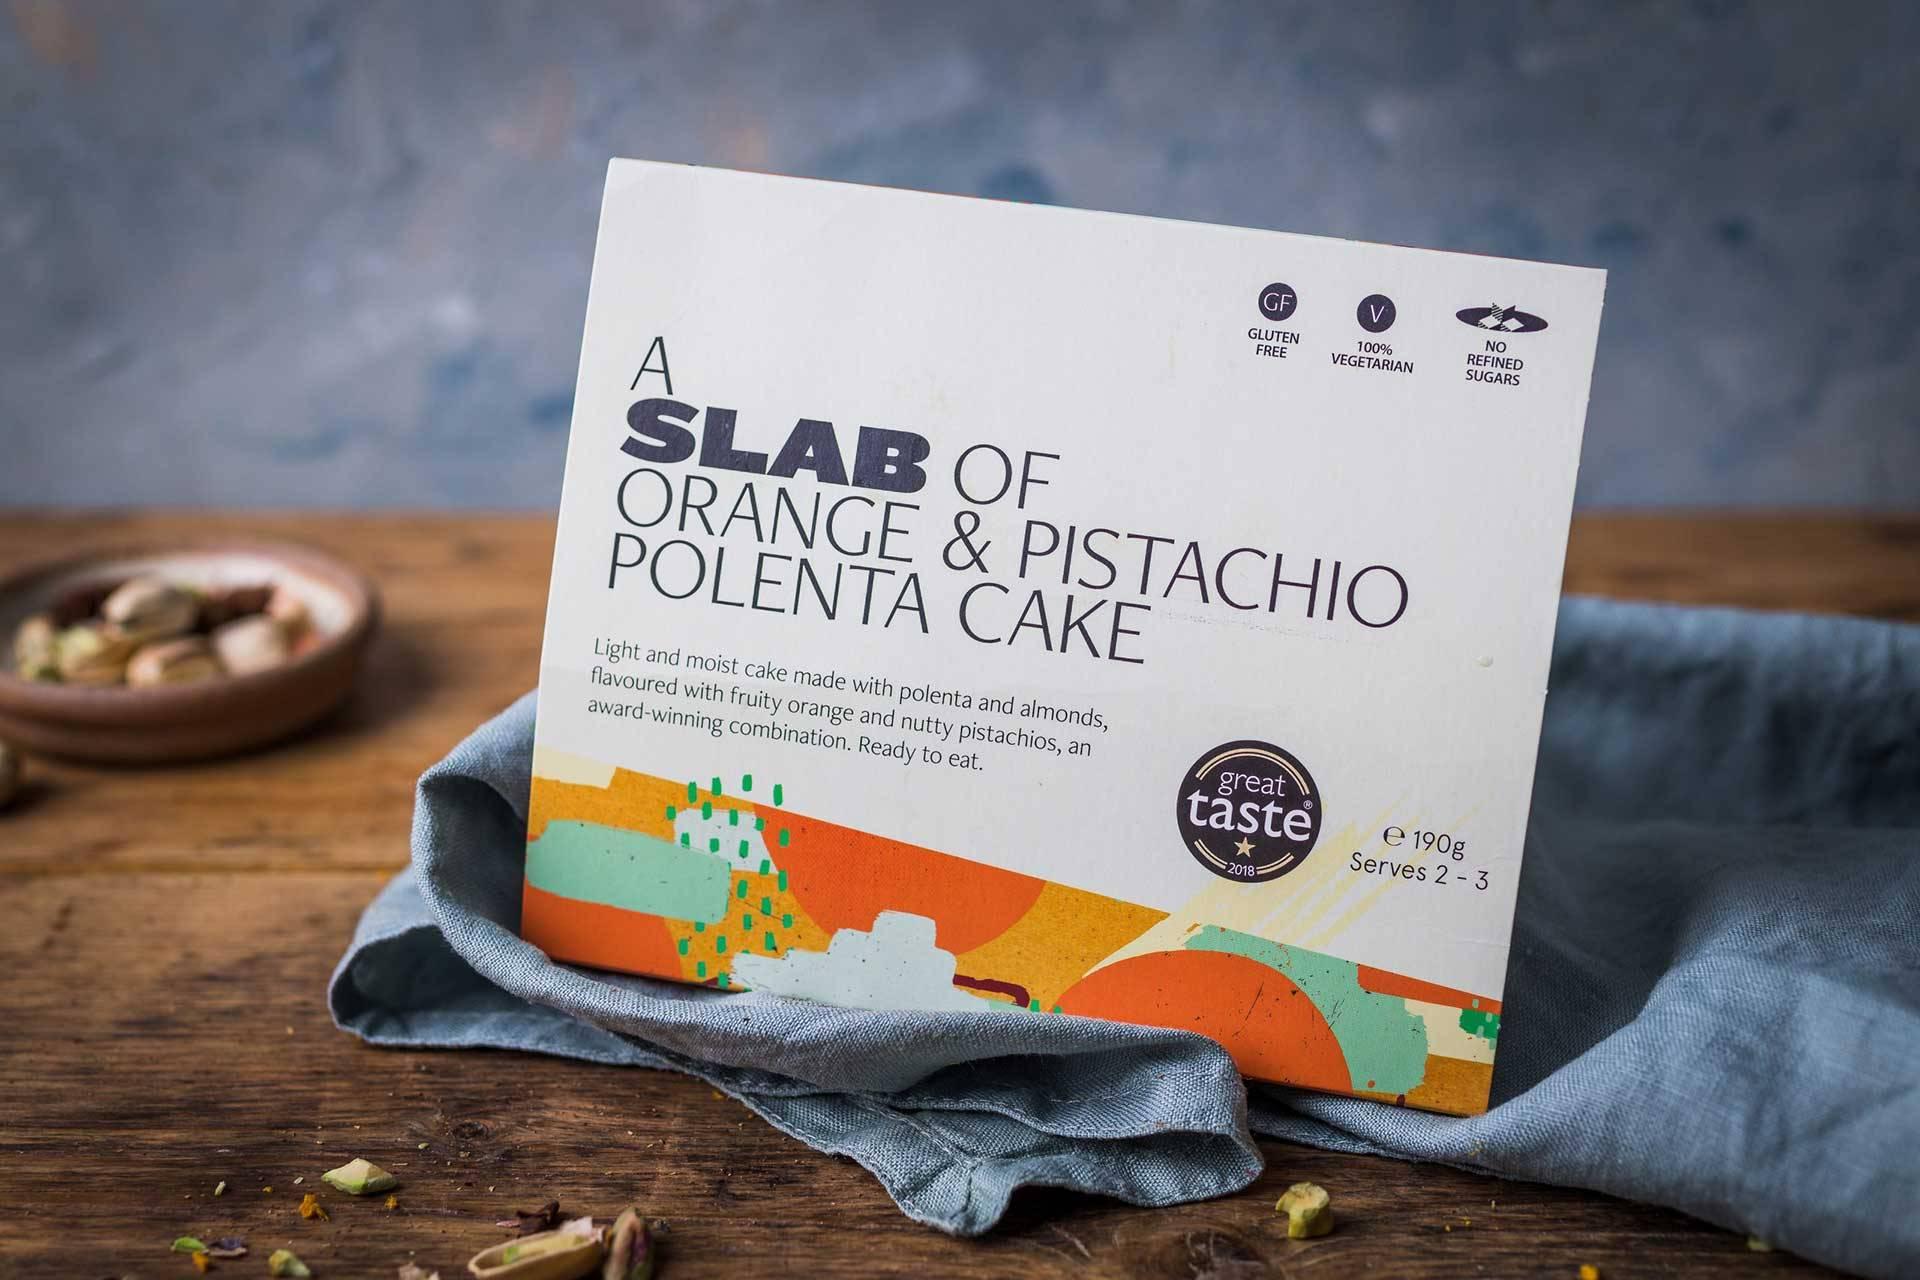 Slab Orange & Pistachio Polenta Cake